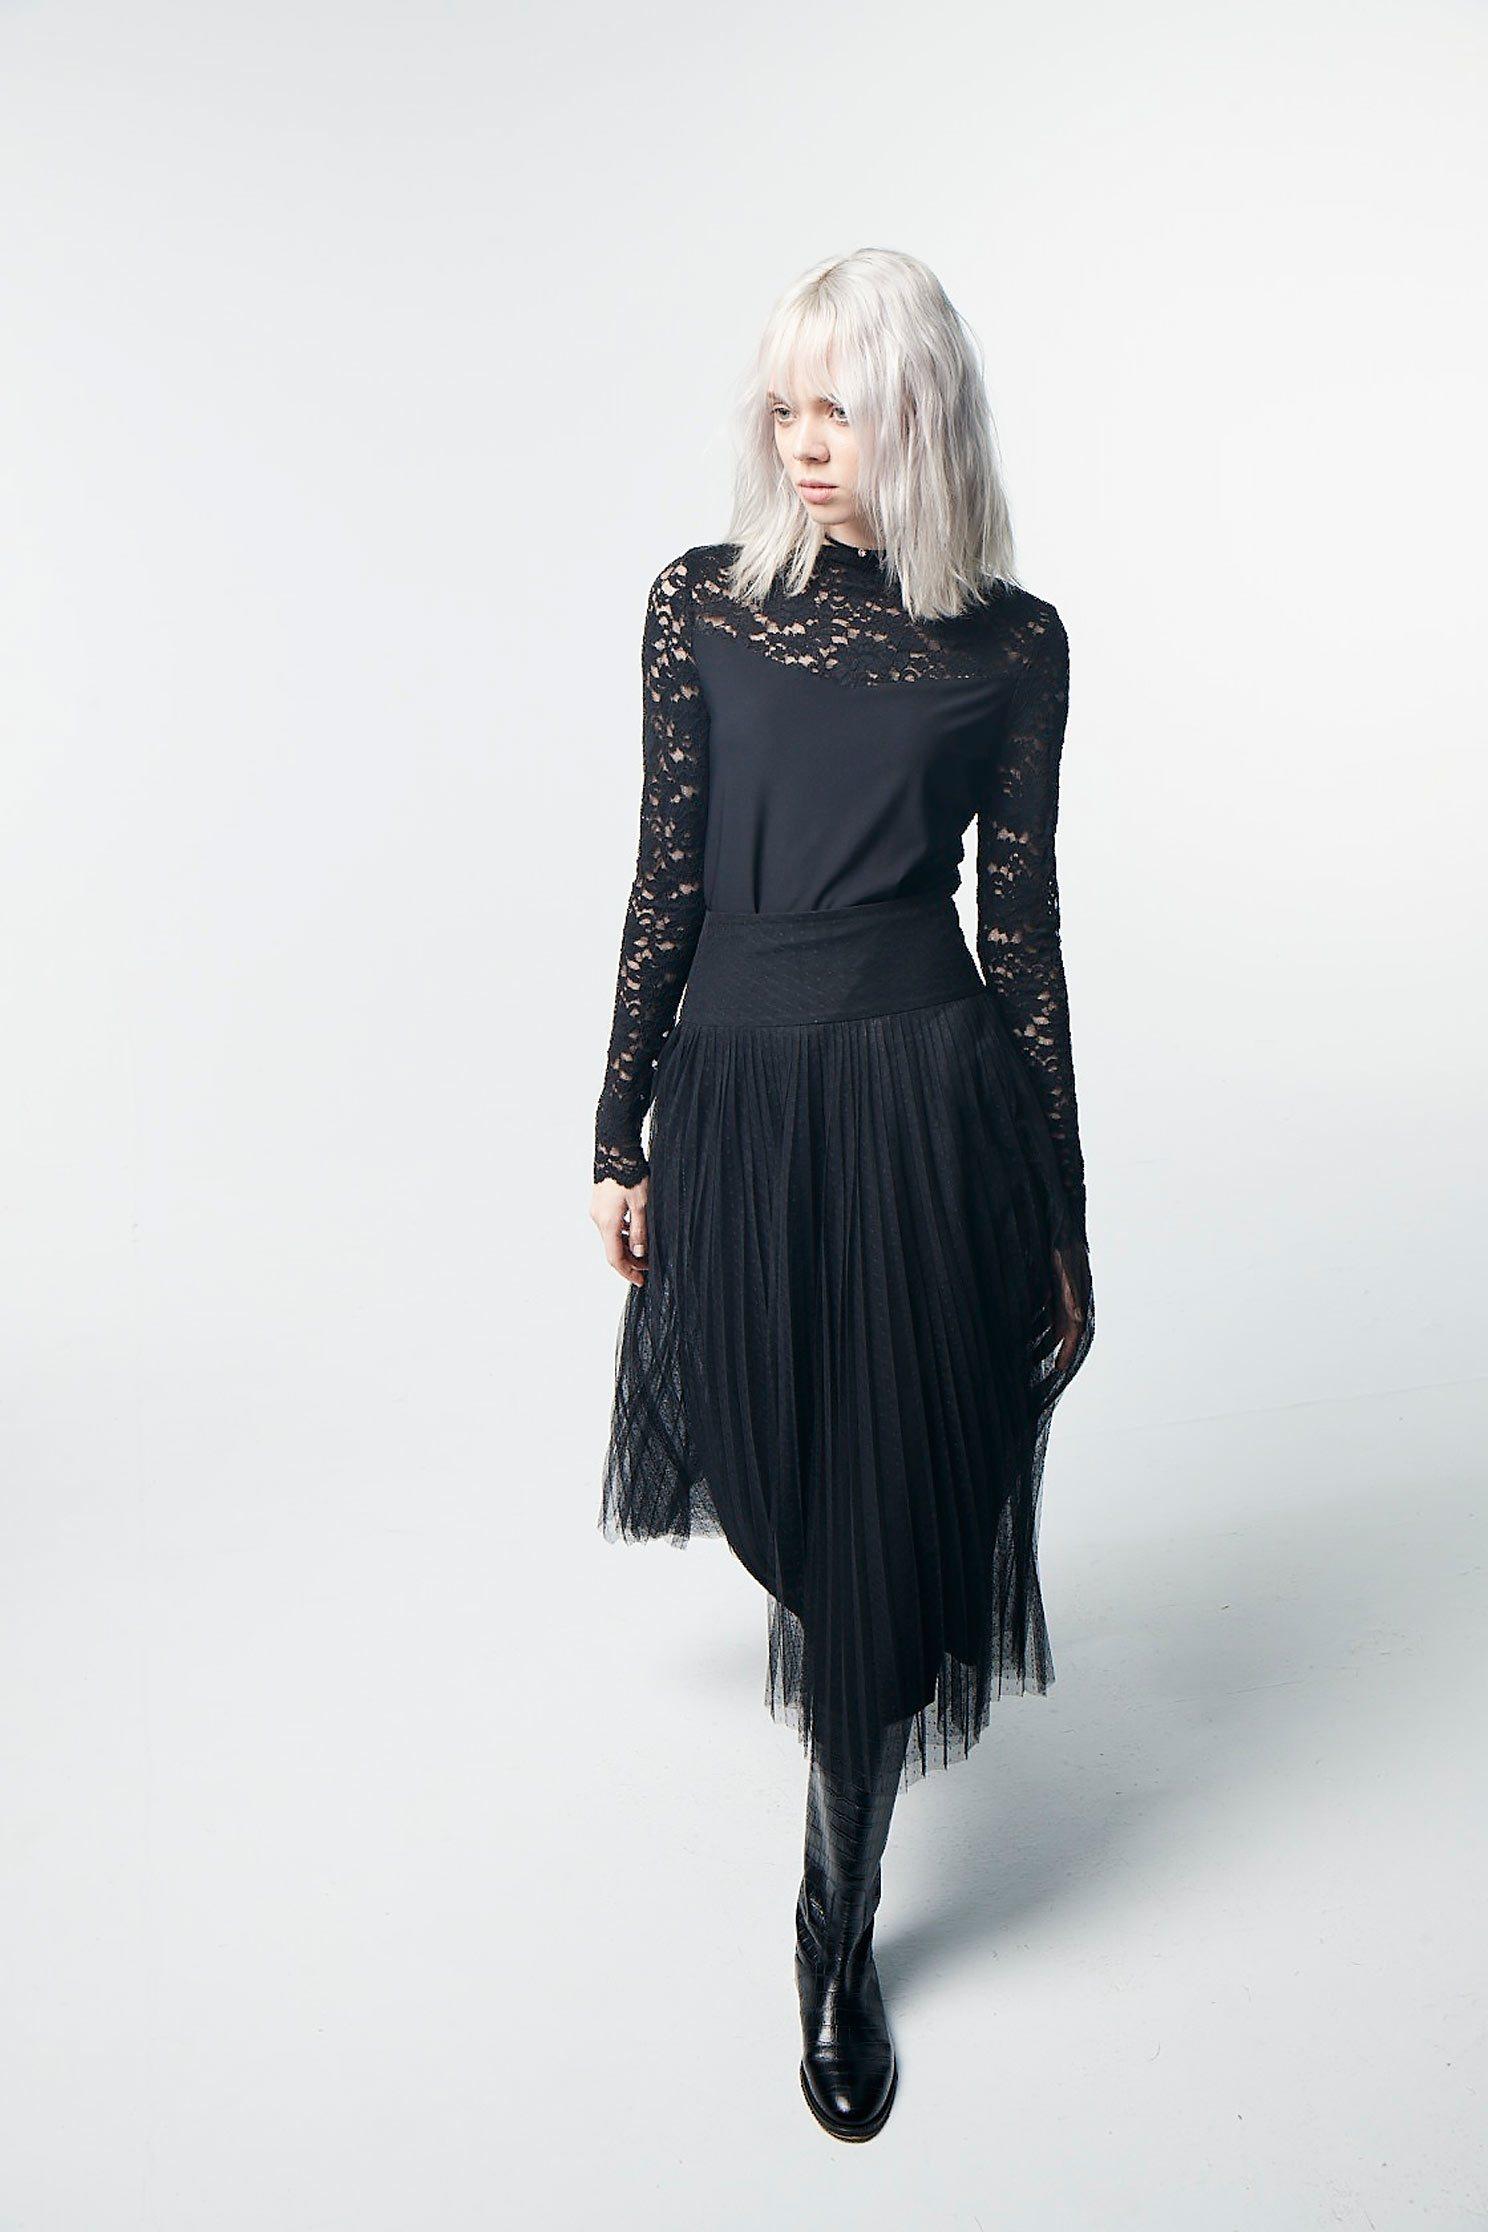 Lace long-sleeved heating top,top,lace,lacedtop,longsleevetop,blacktop